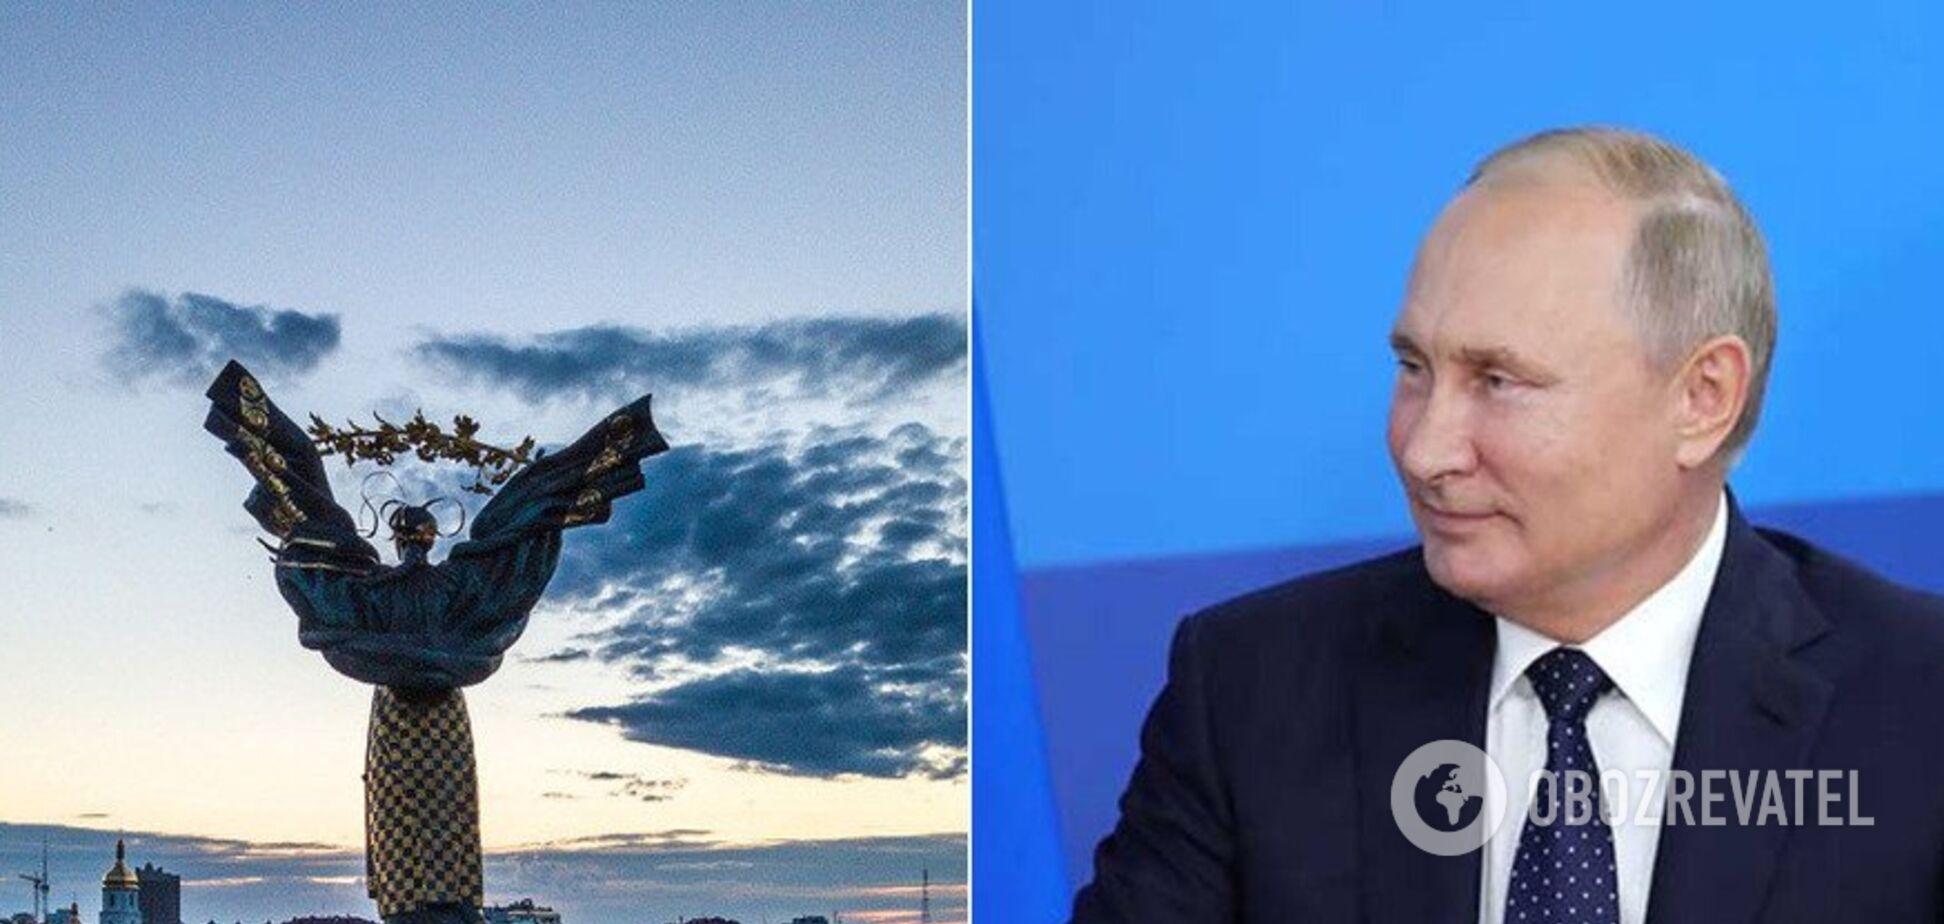 В Киеве суд освободил от ответственности члена партии Путина